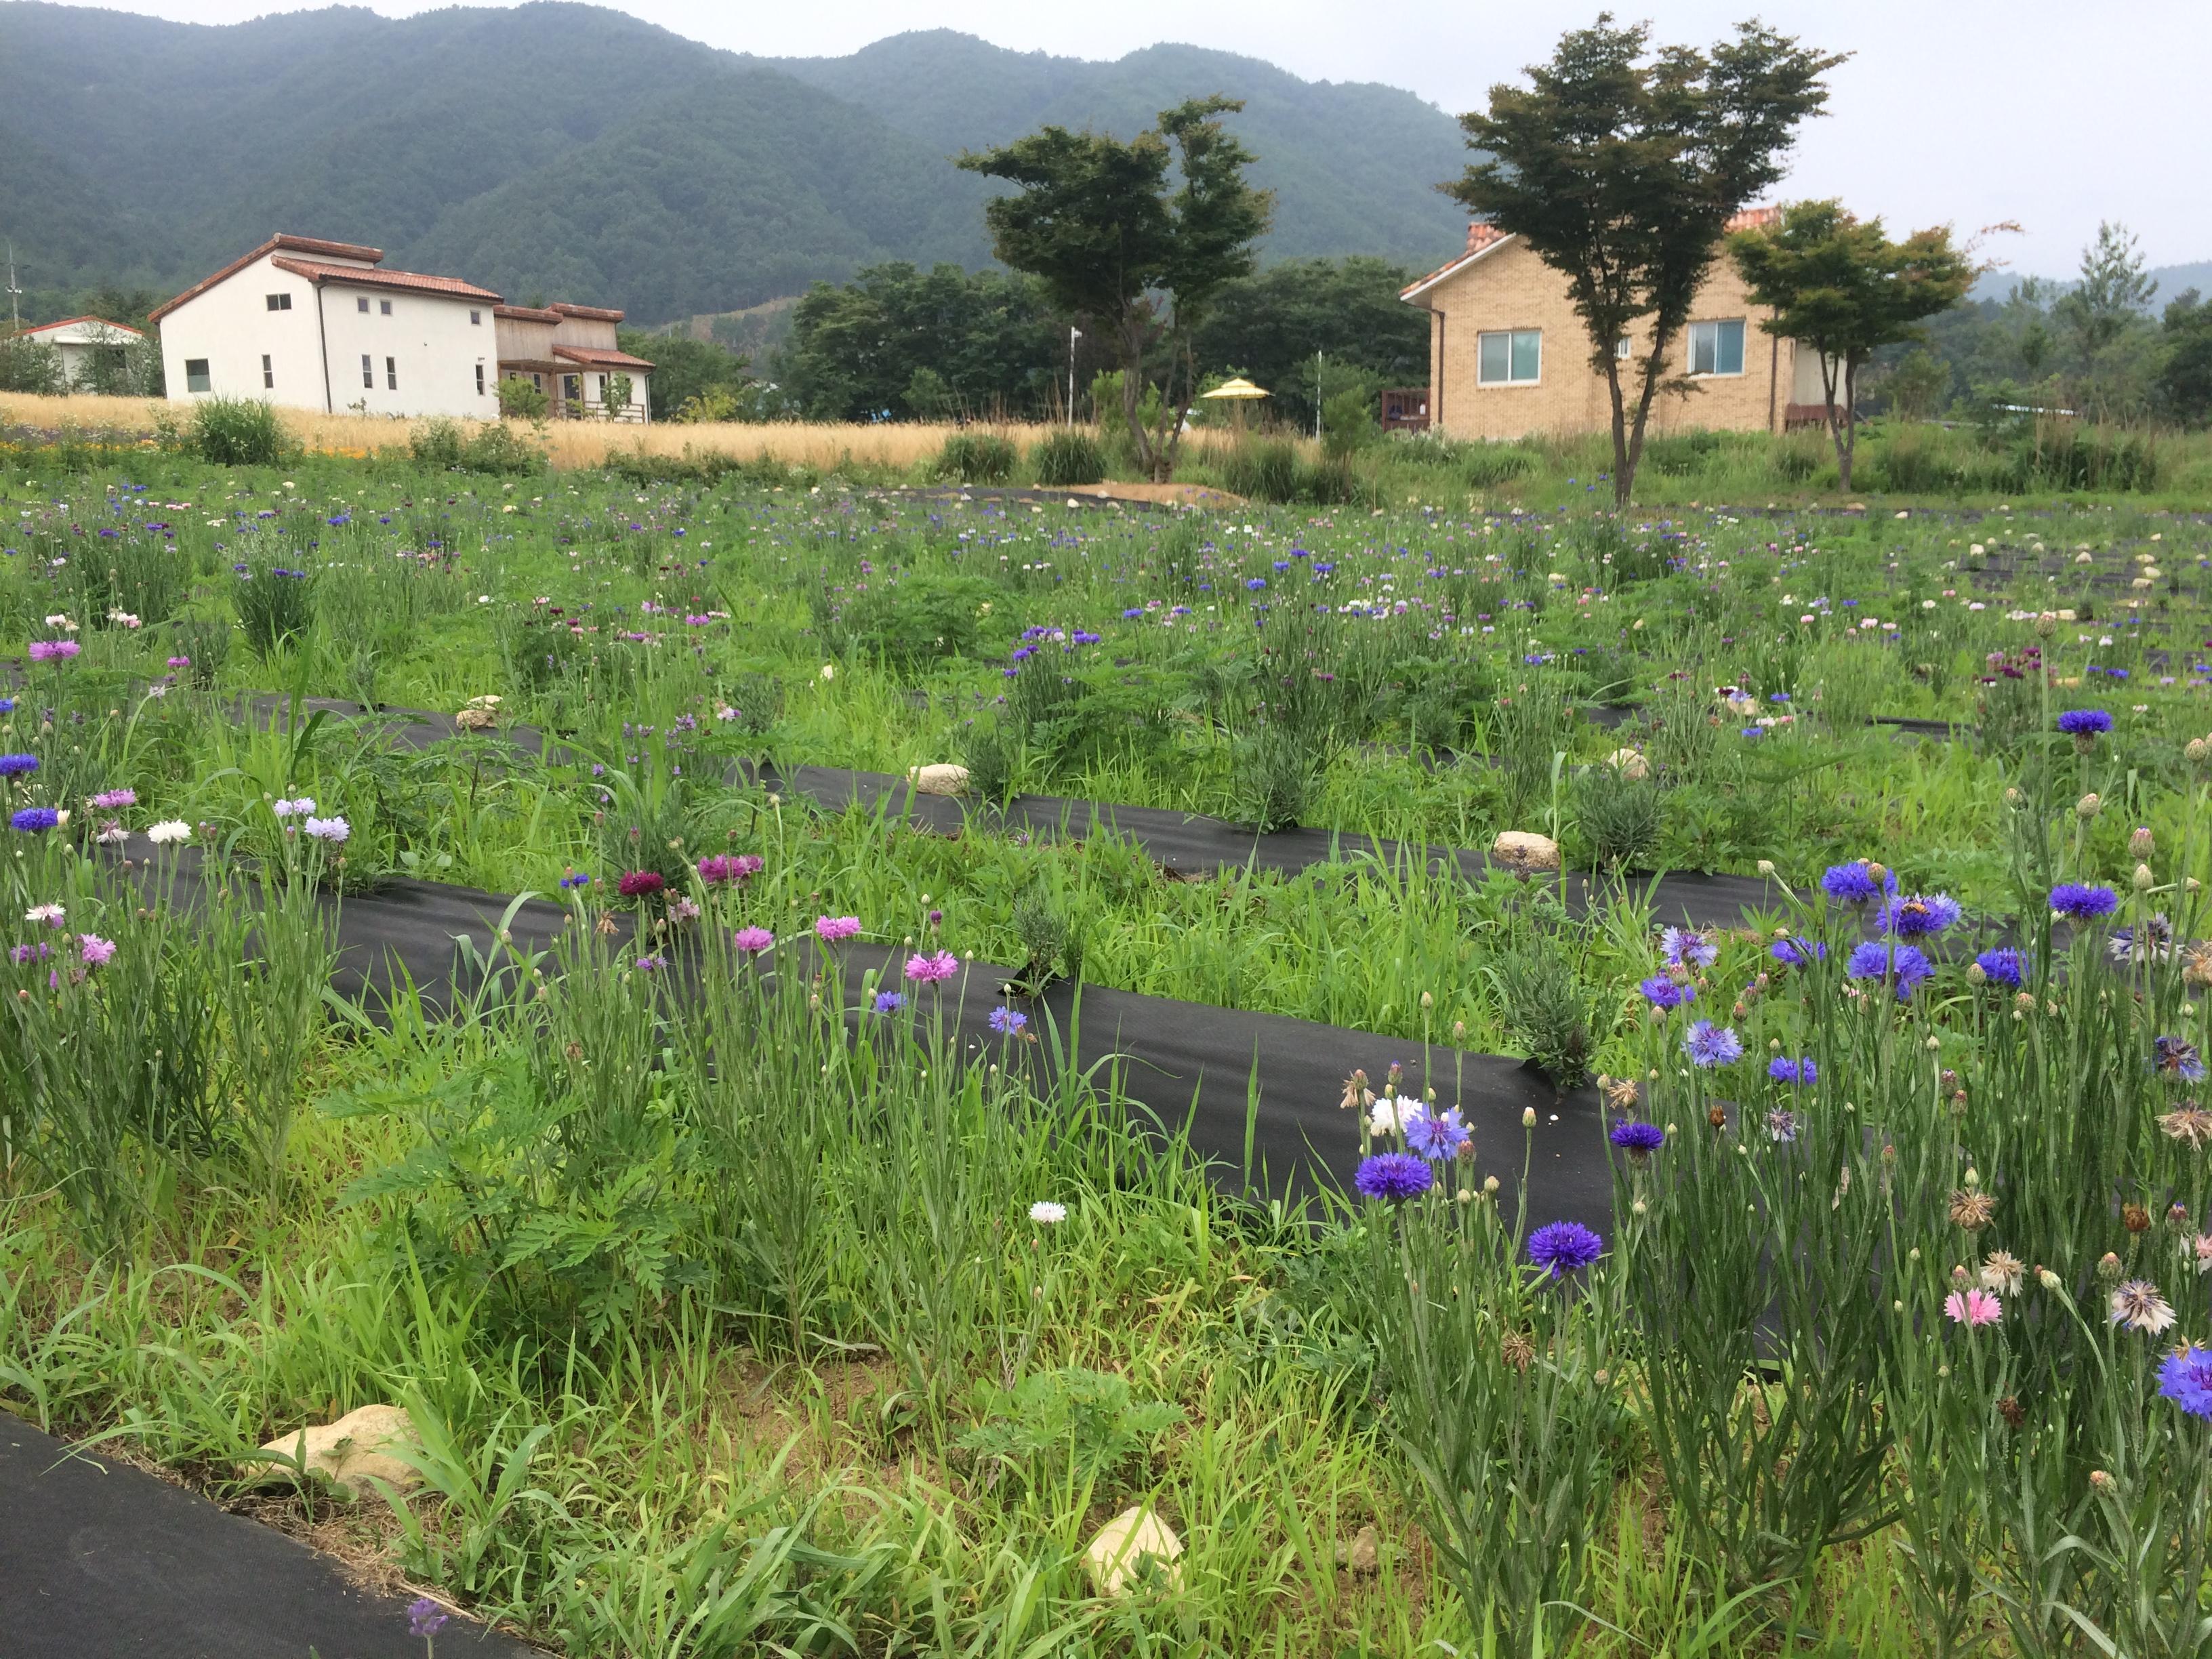 Daytrip From Seoul: Hani Lavender Farm (하늬 라벤더 팜)